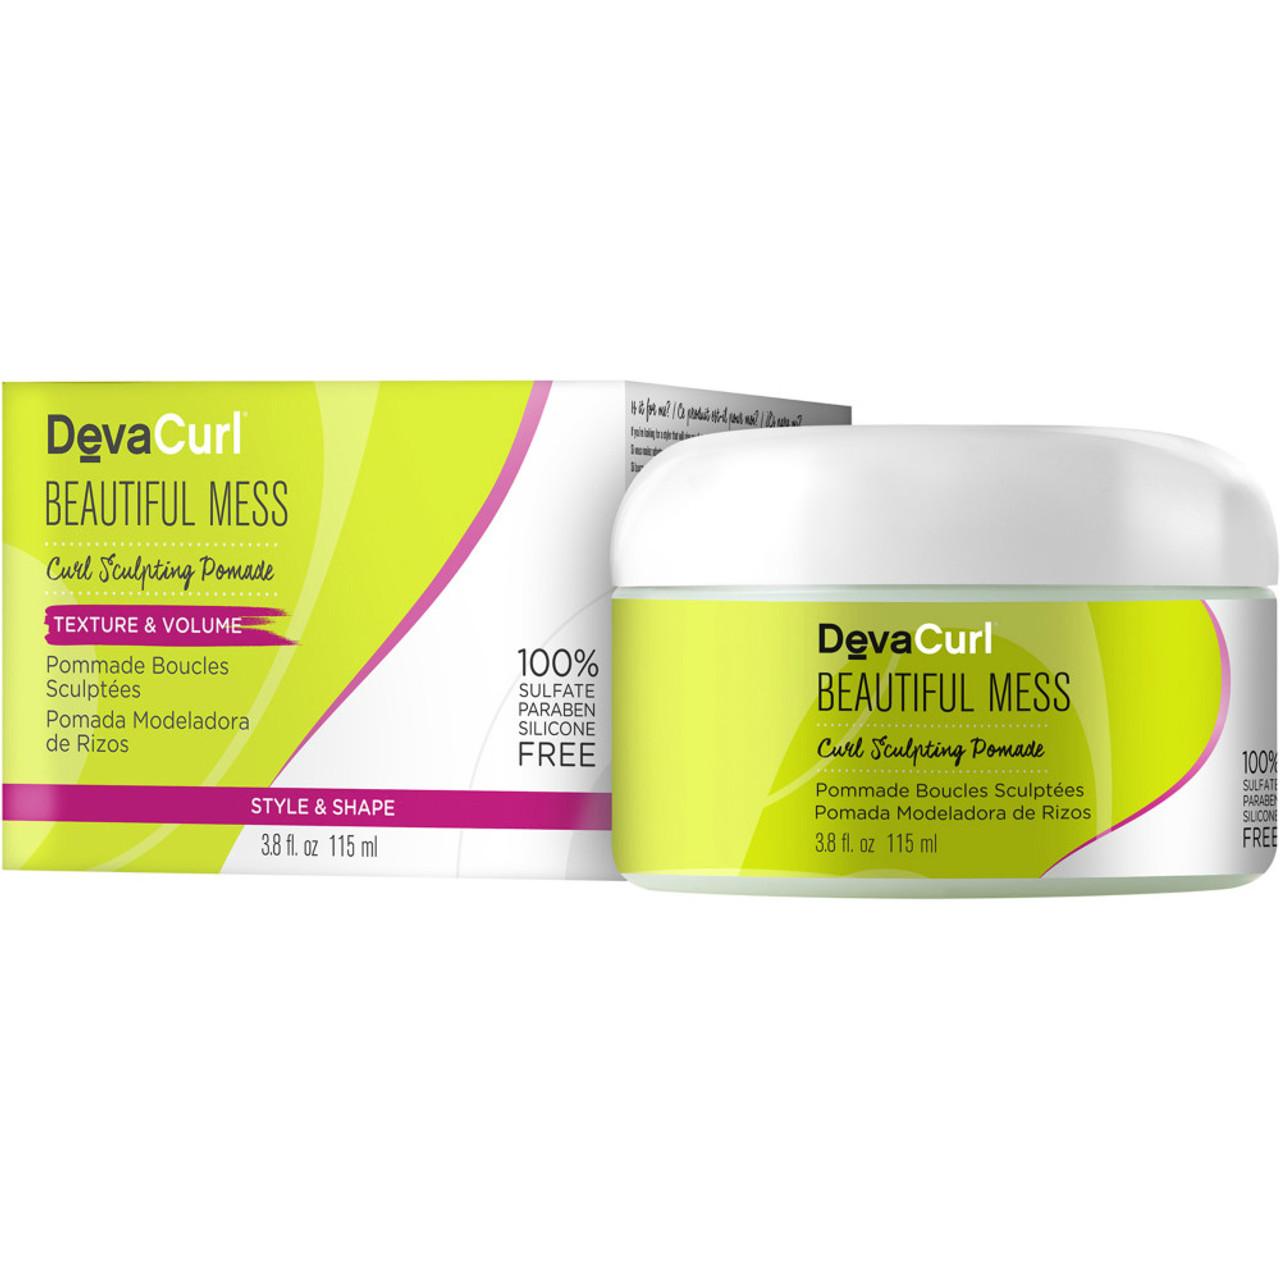 DevaCurl Beautiful Mess Curl Pomade 3.8 oz